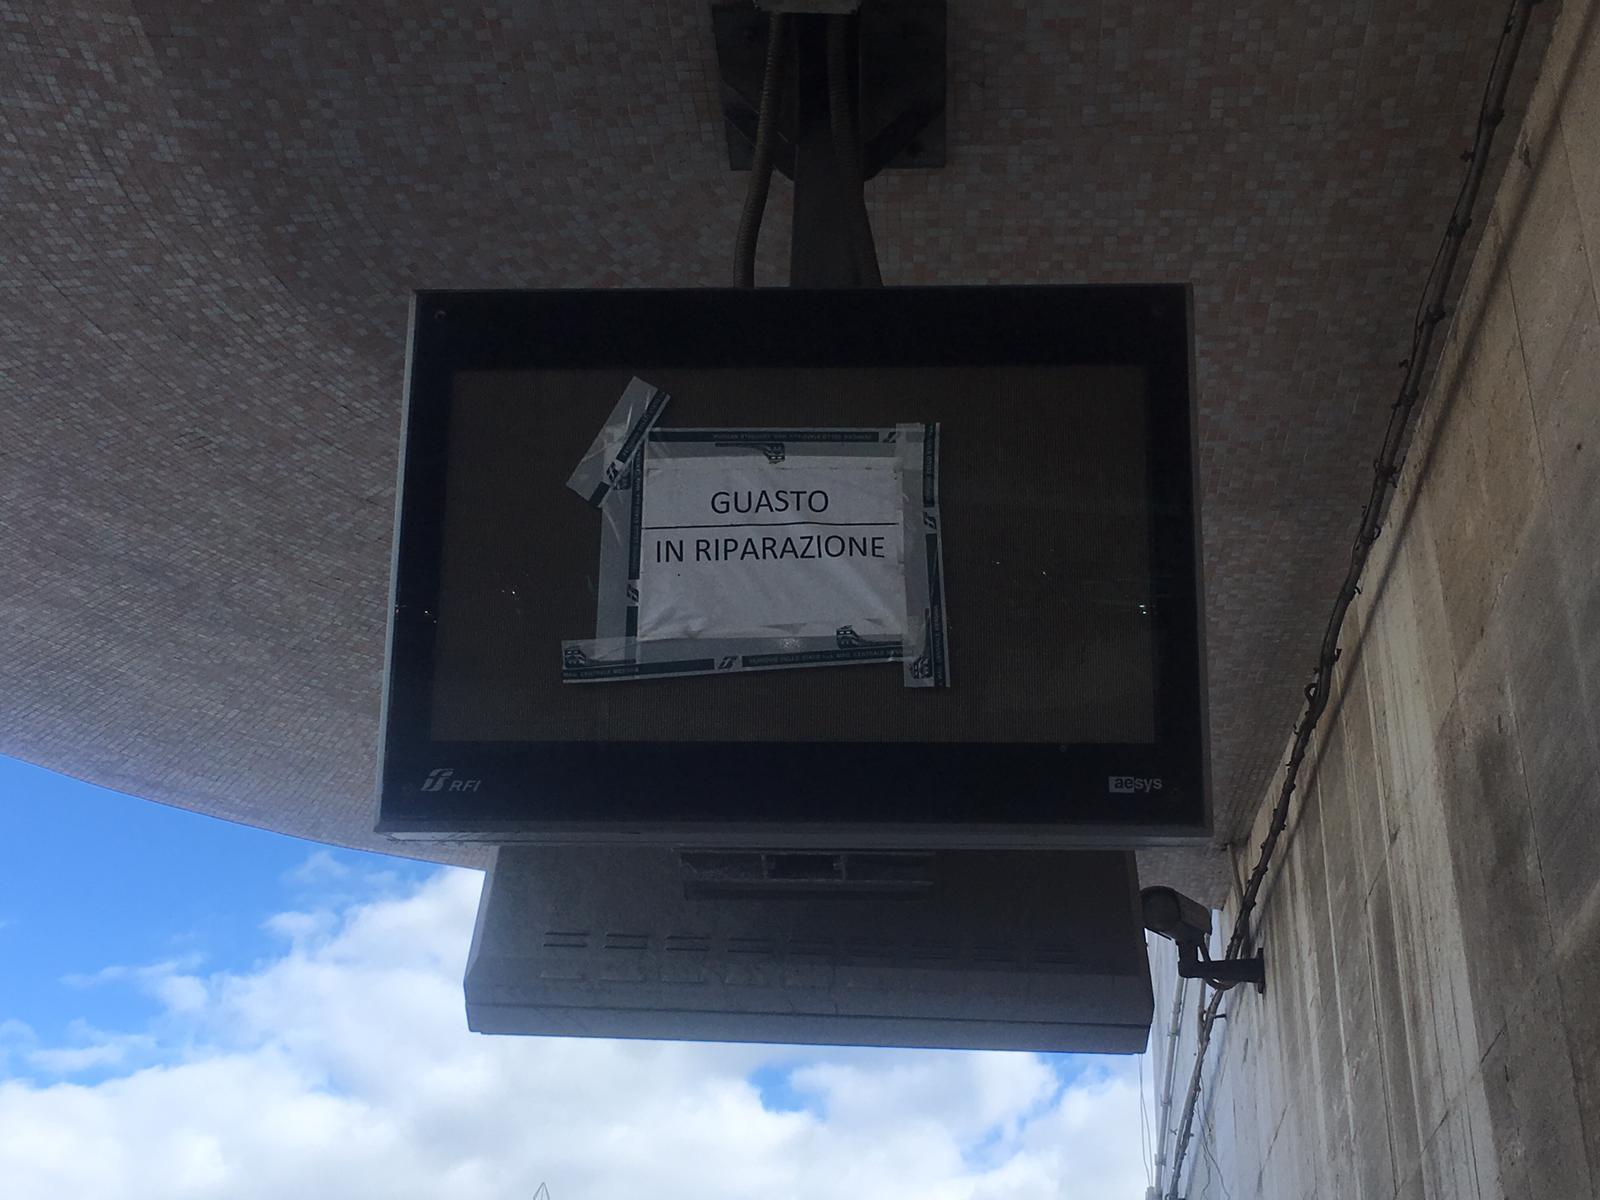 Stazione Marittima